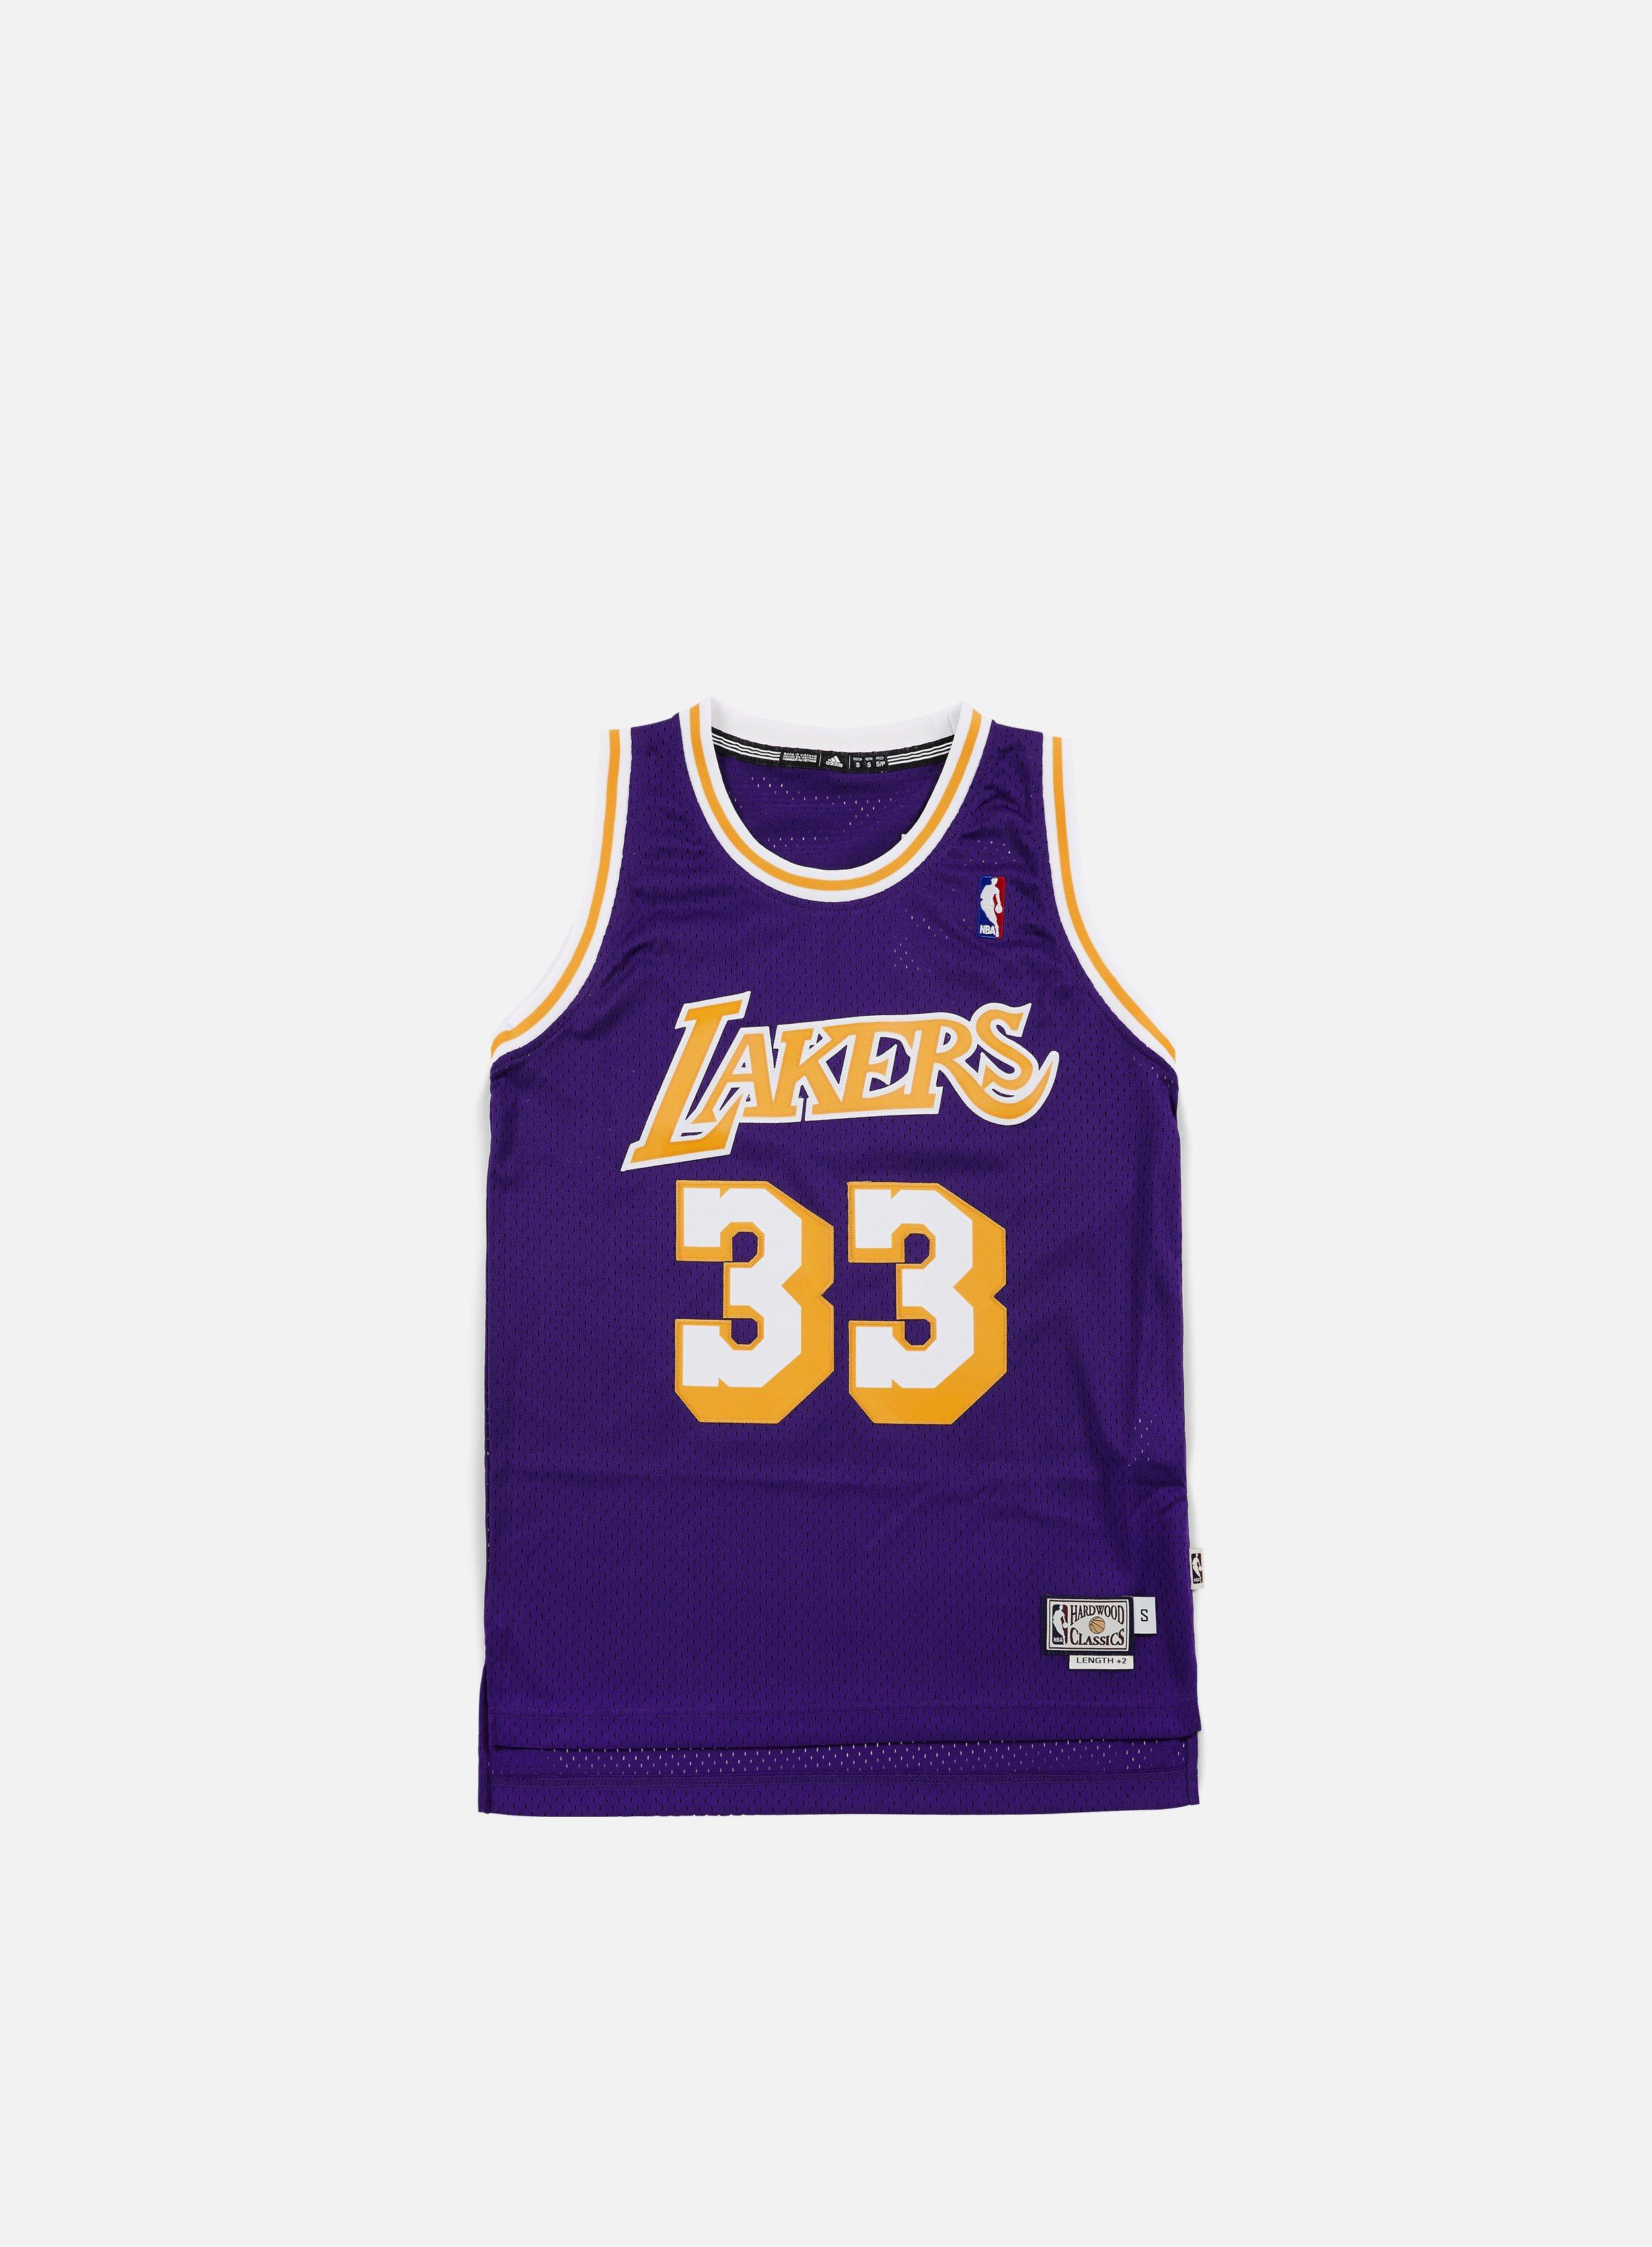 LA Lakers Retired Jersey Kareem Abdul- Jabbar